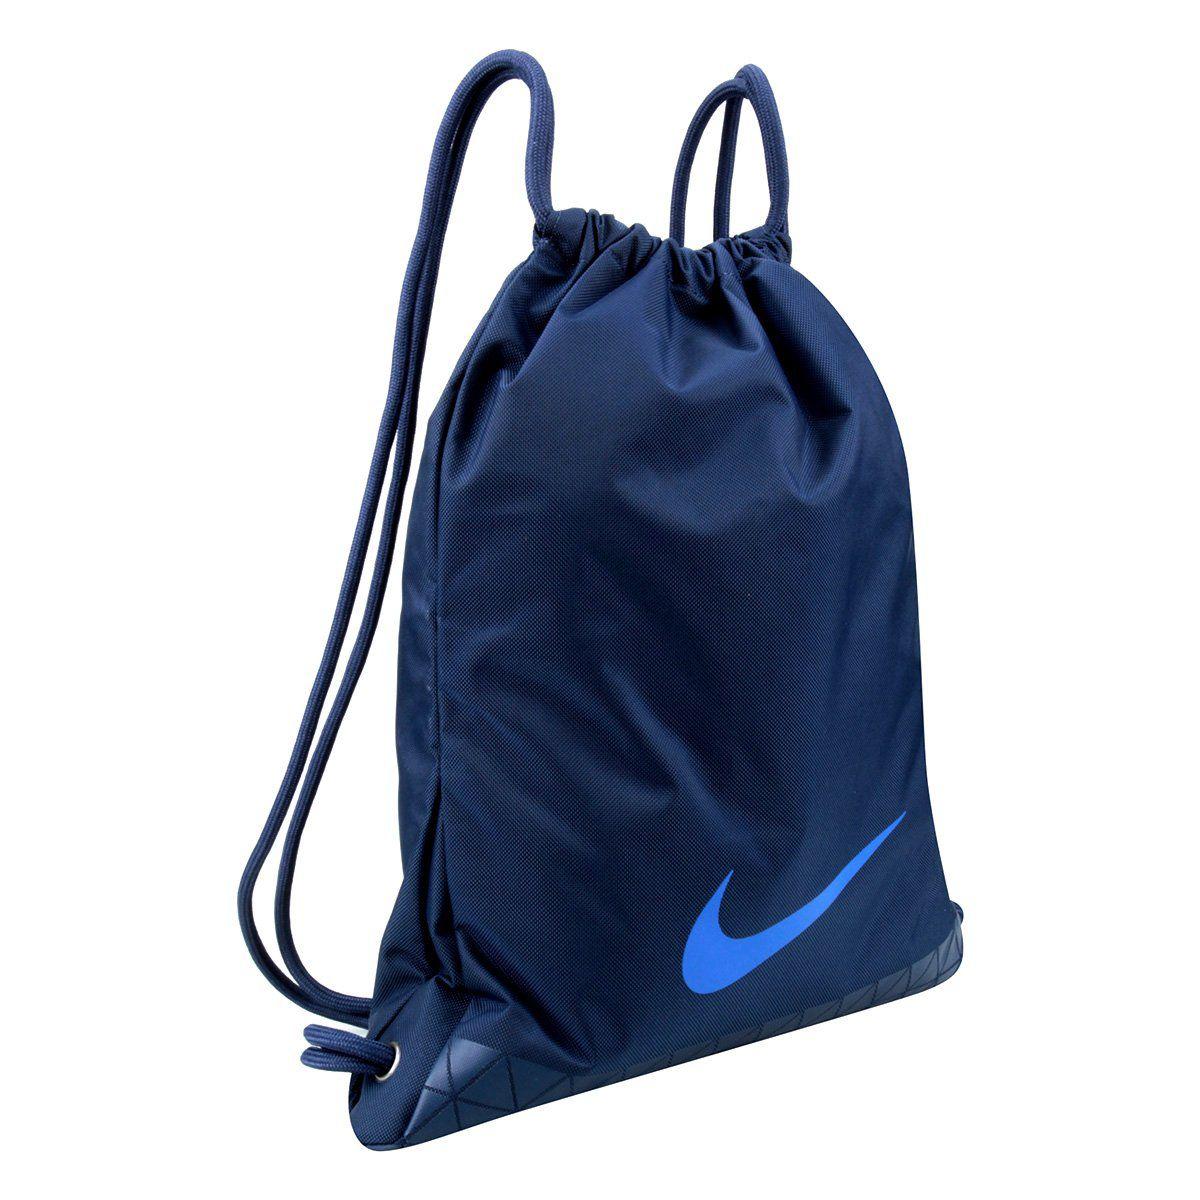 Sacola Nike Gym Vapor 2.0 - 12 Litros - Azul  - REAL ESPORTE